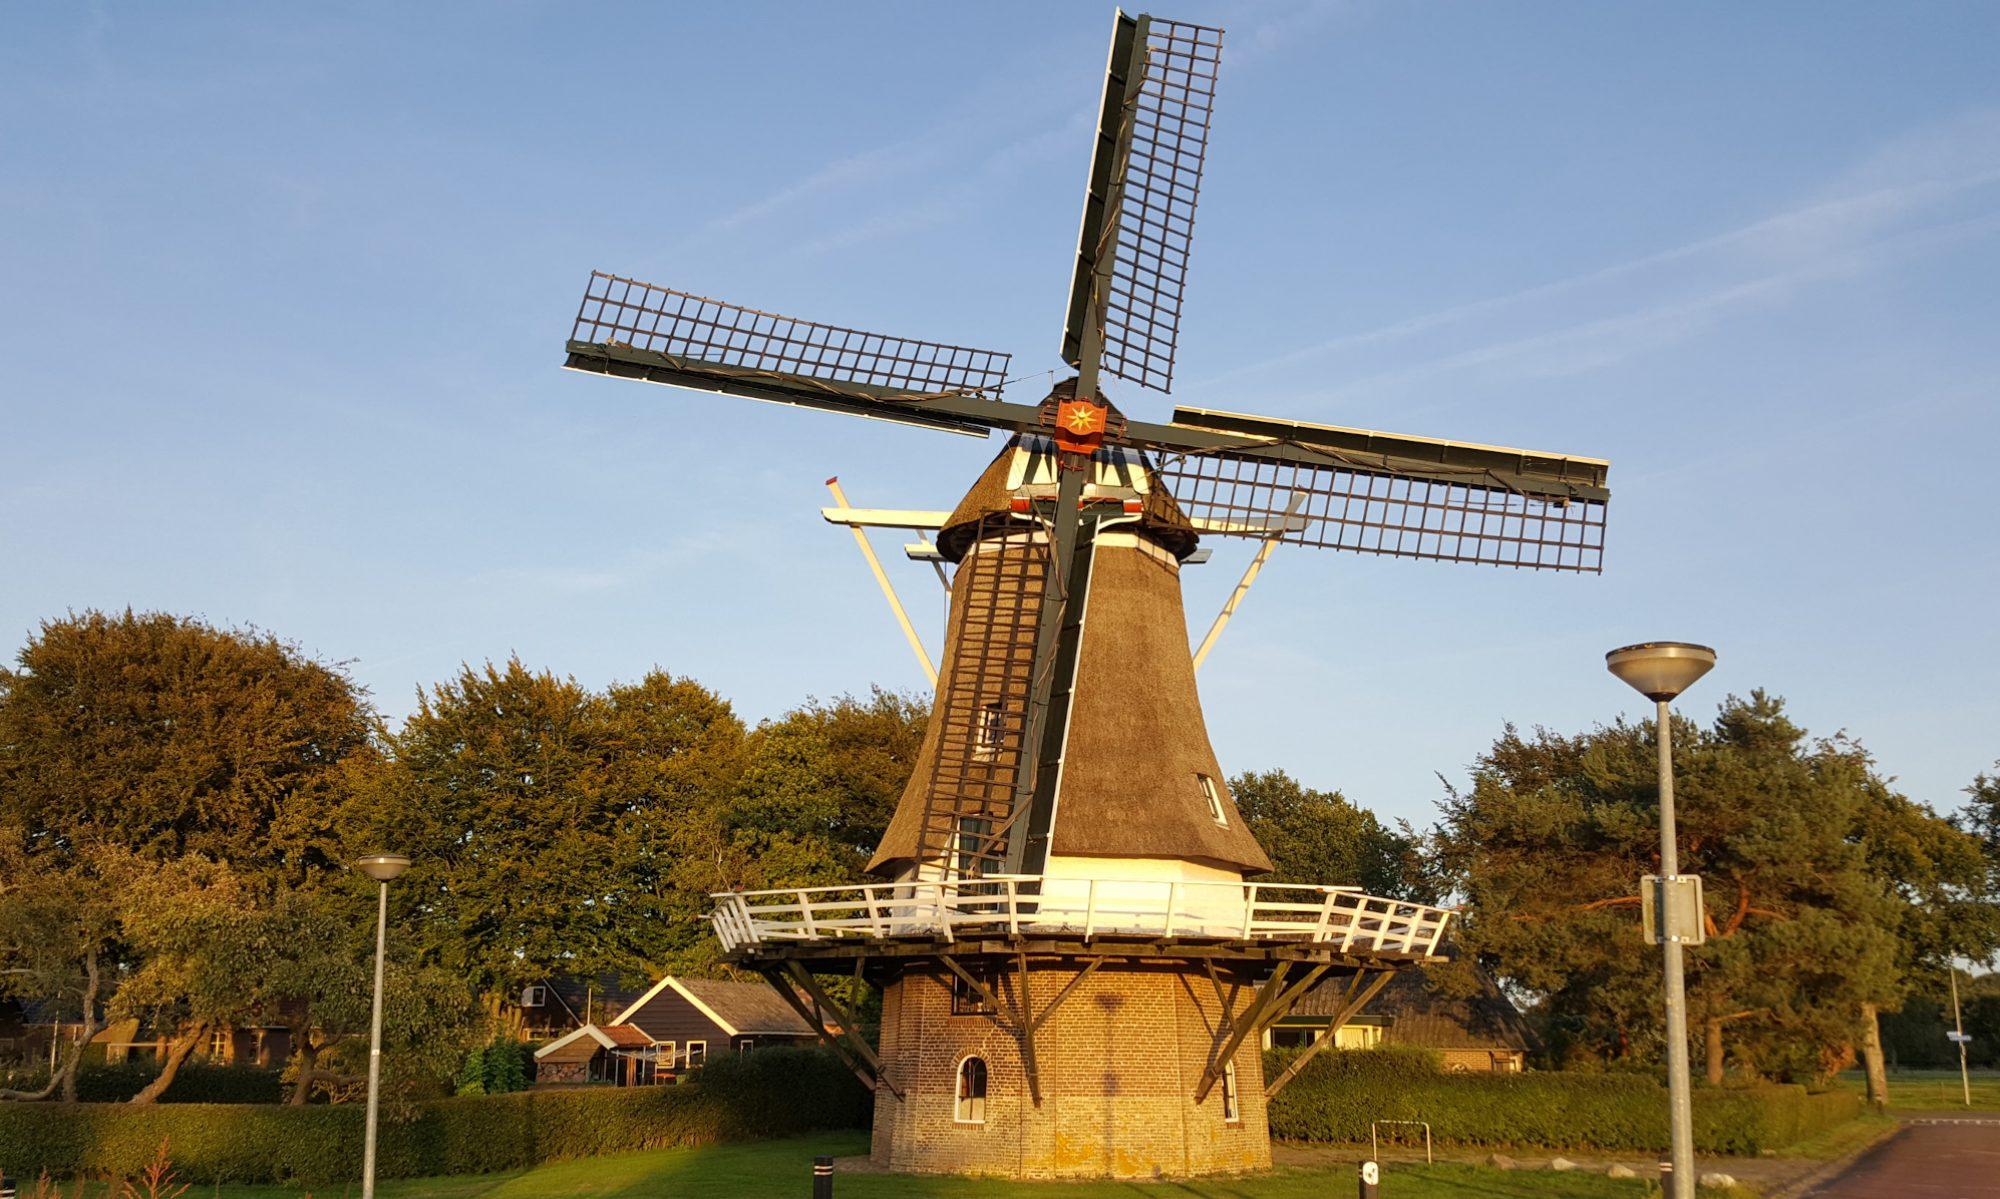 ecwesterveld.nl